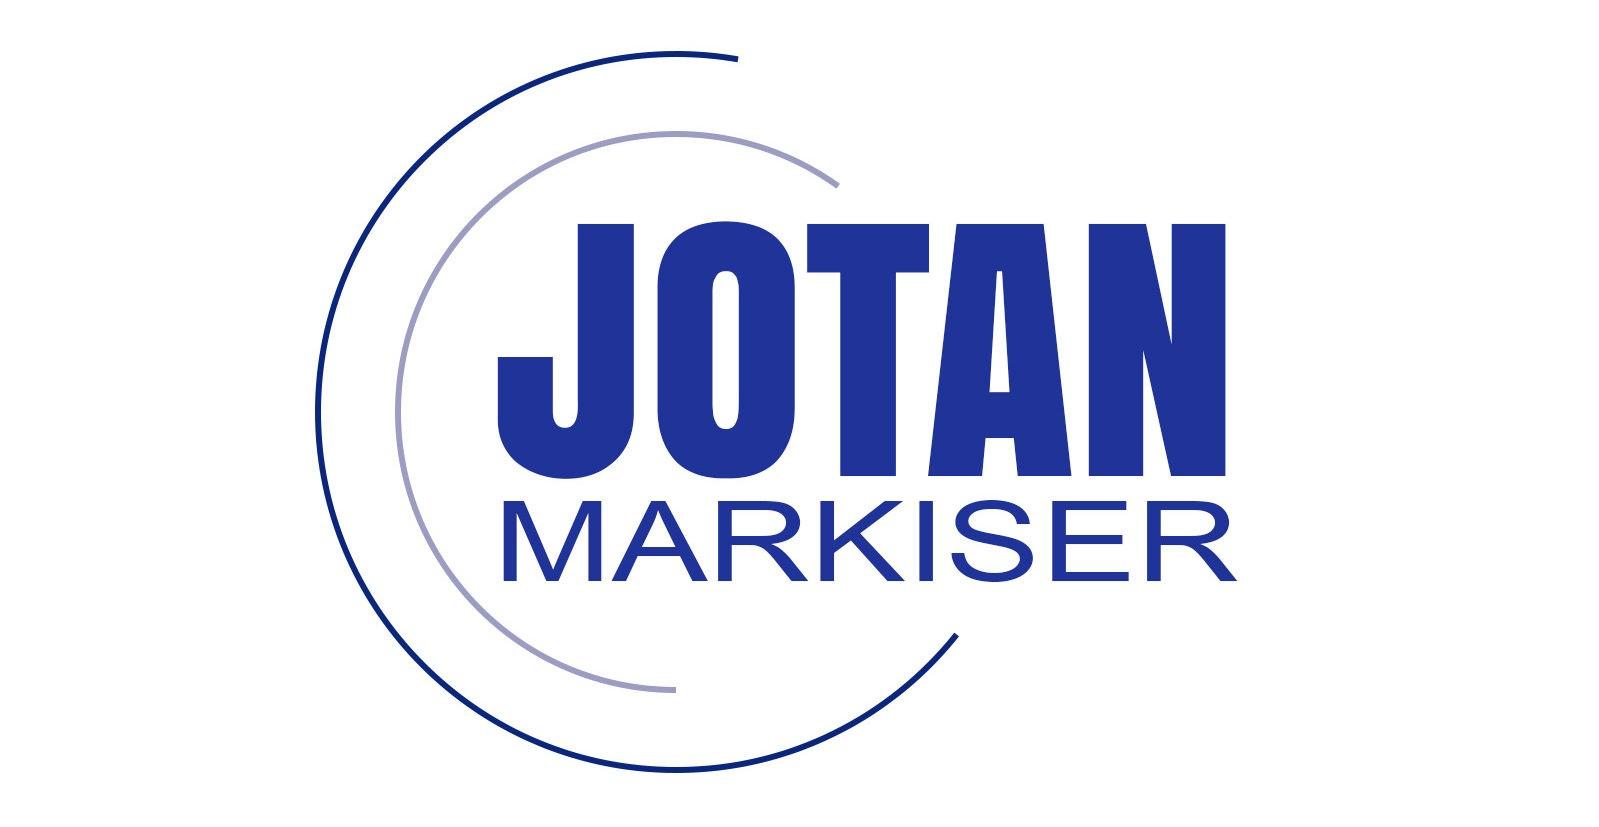 Jotan Markiser